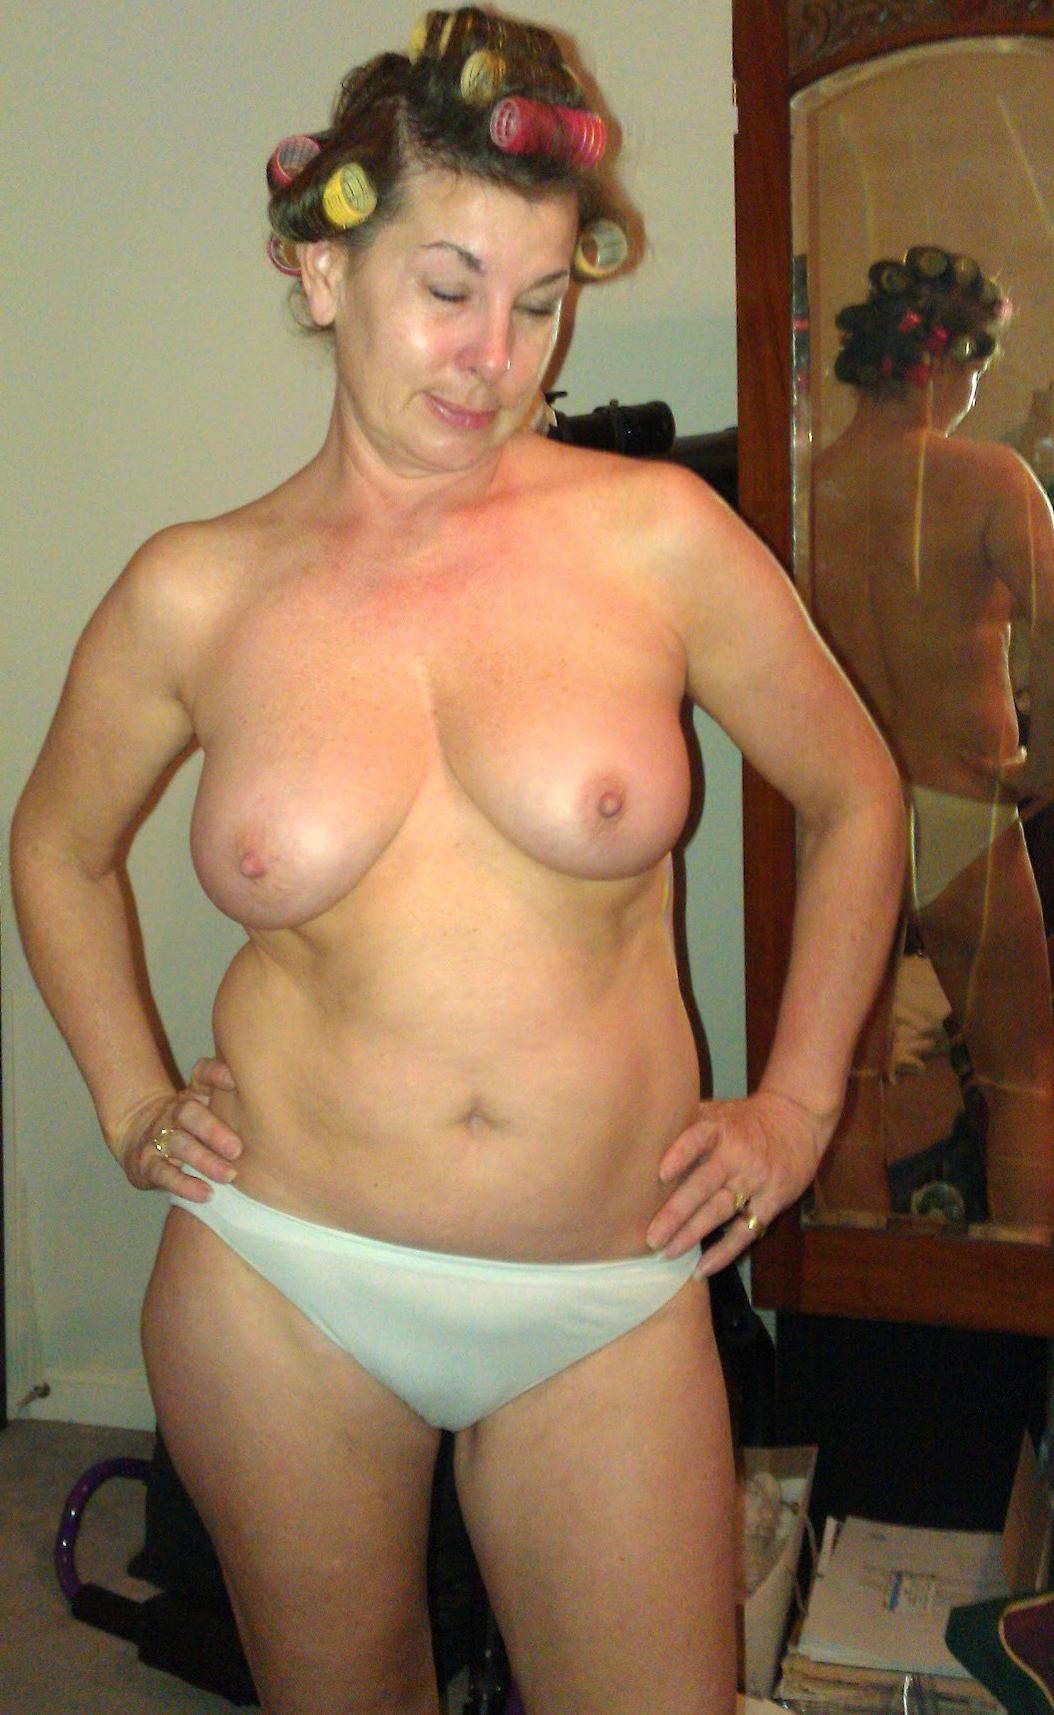 Pics pussy free mom Teen Girls